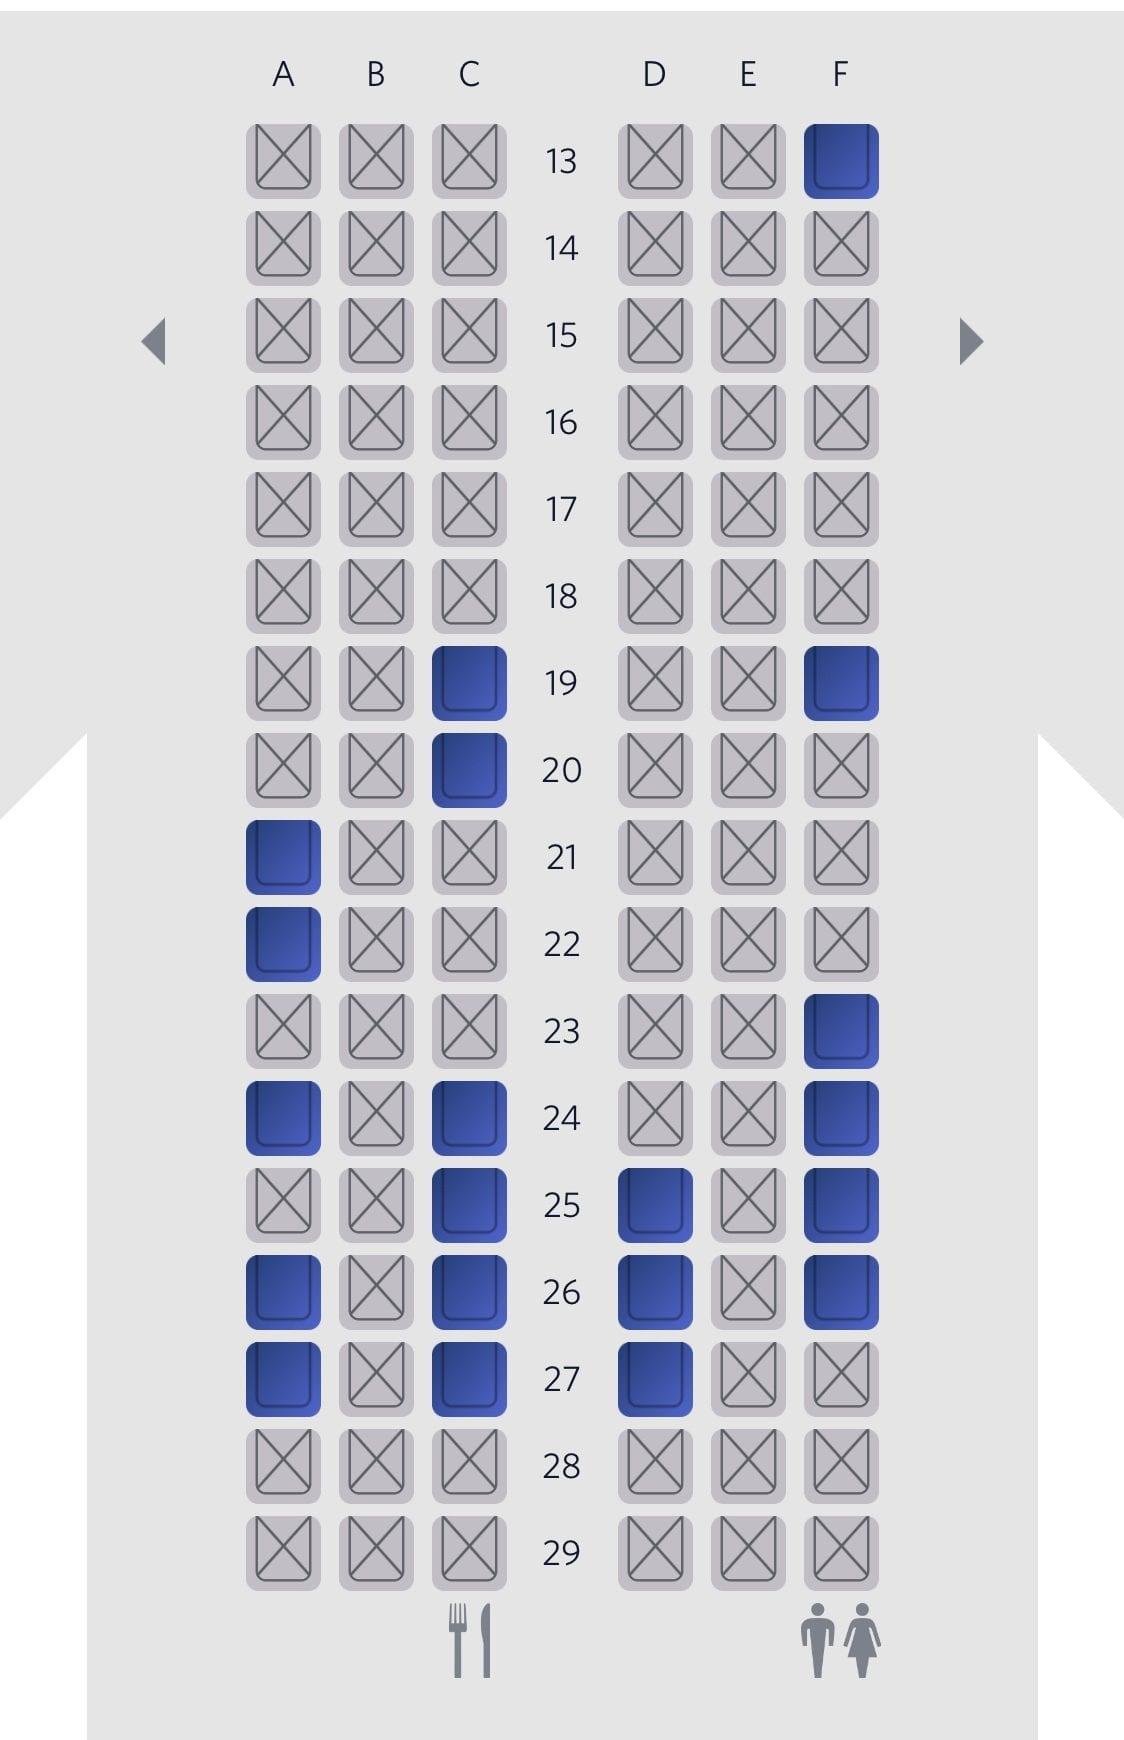 delta blocking middle seats